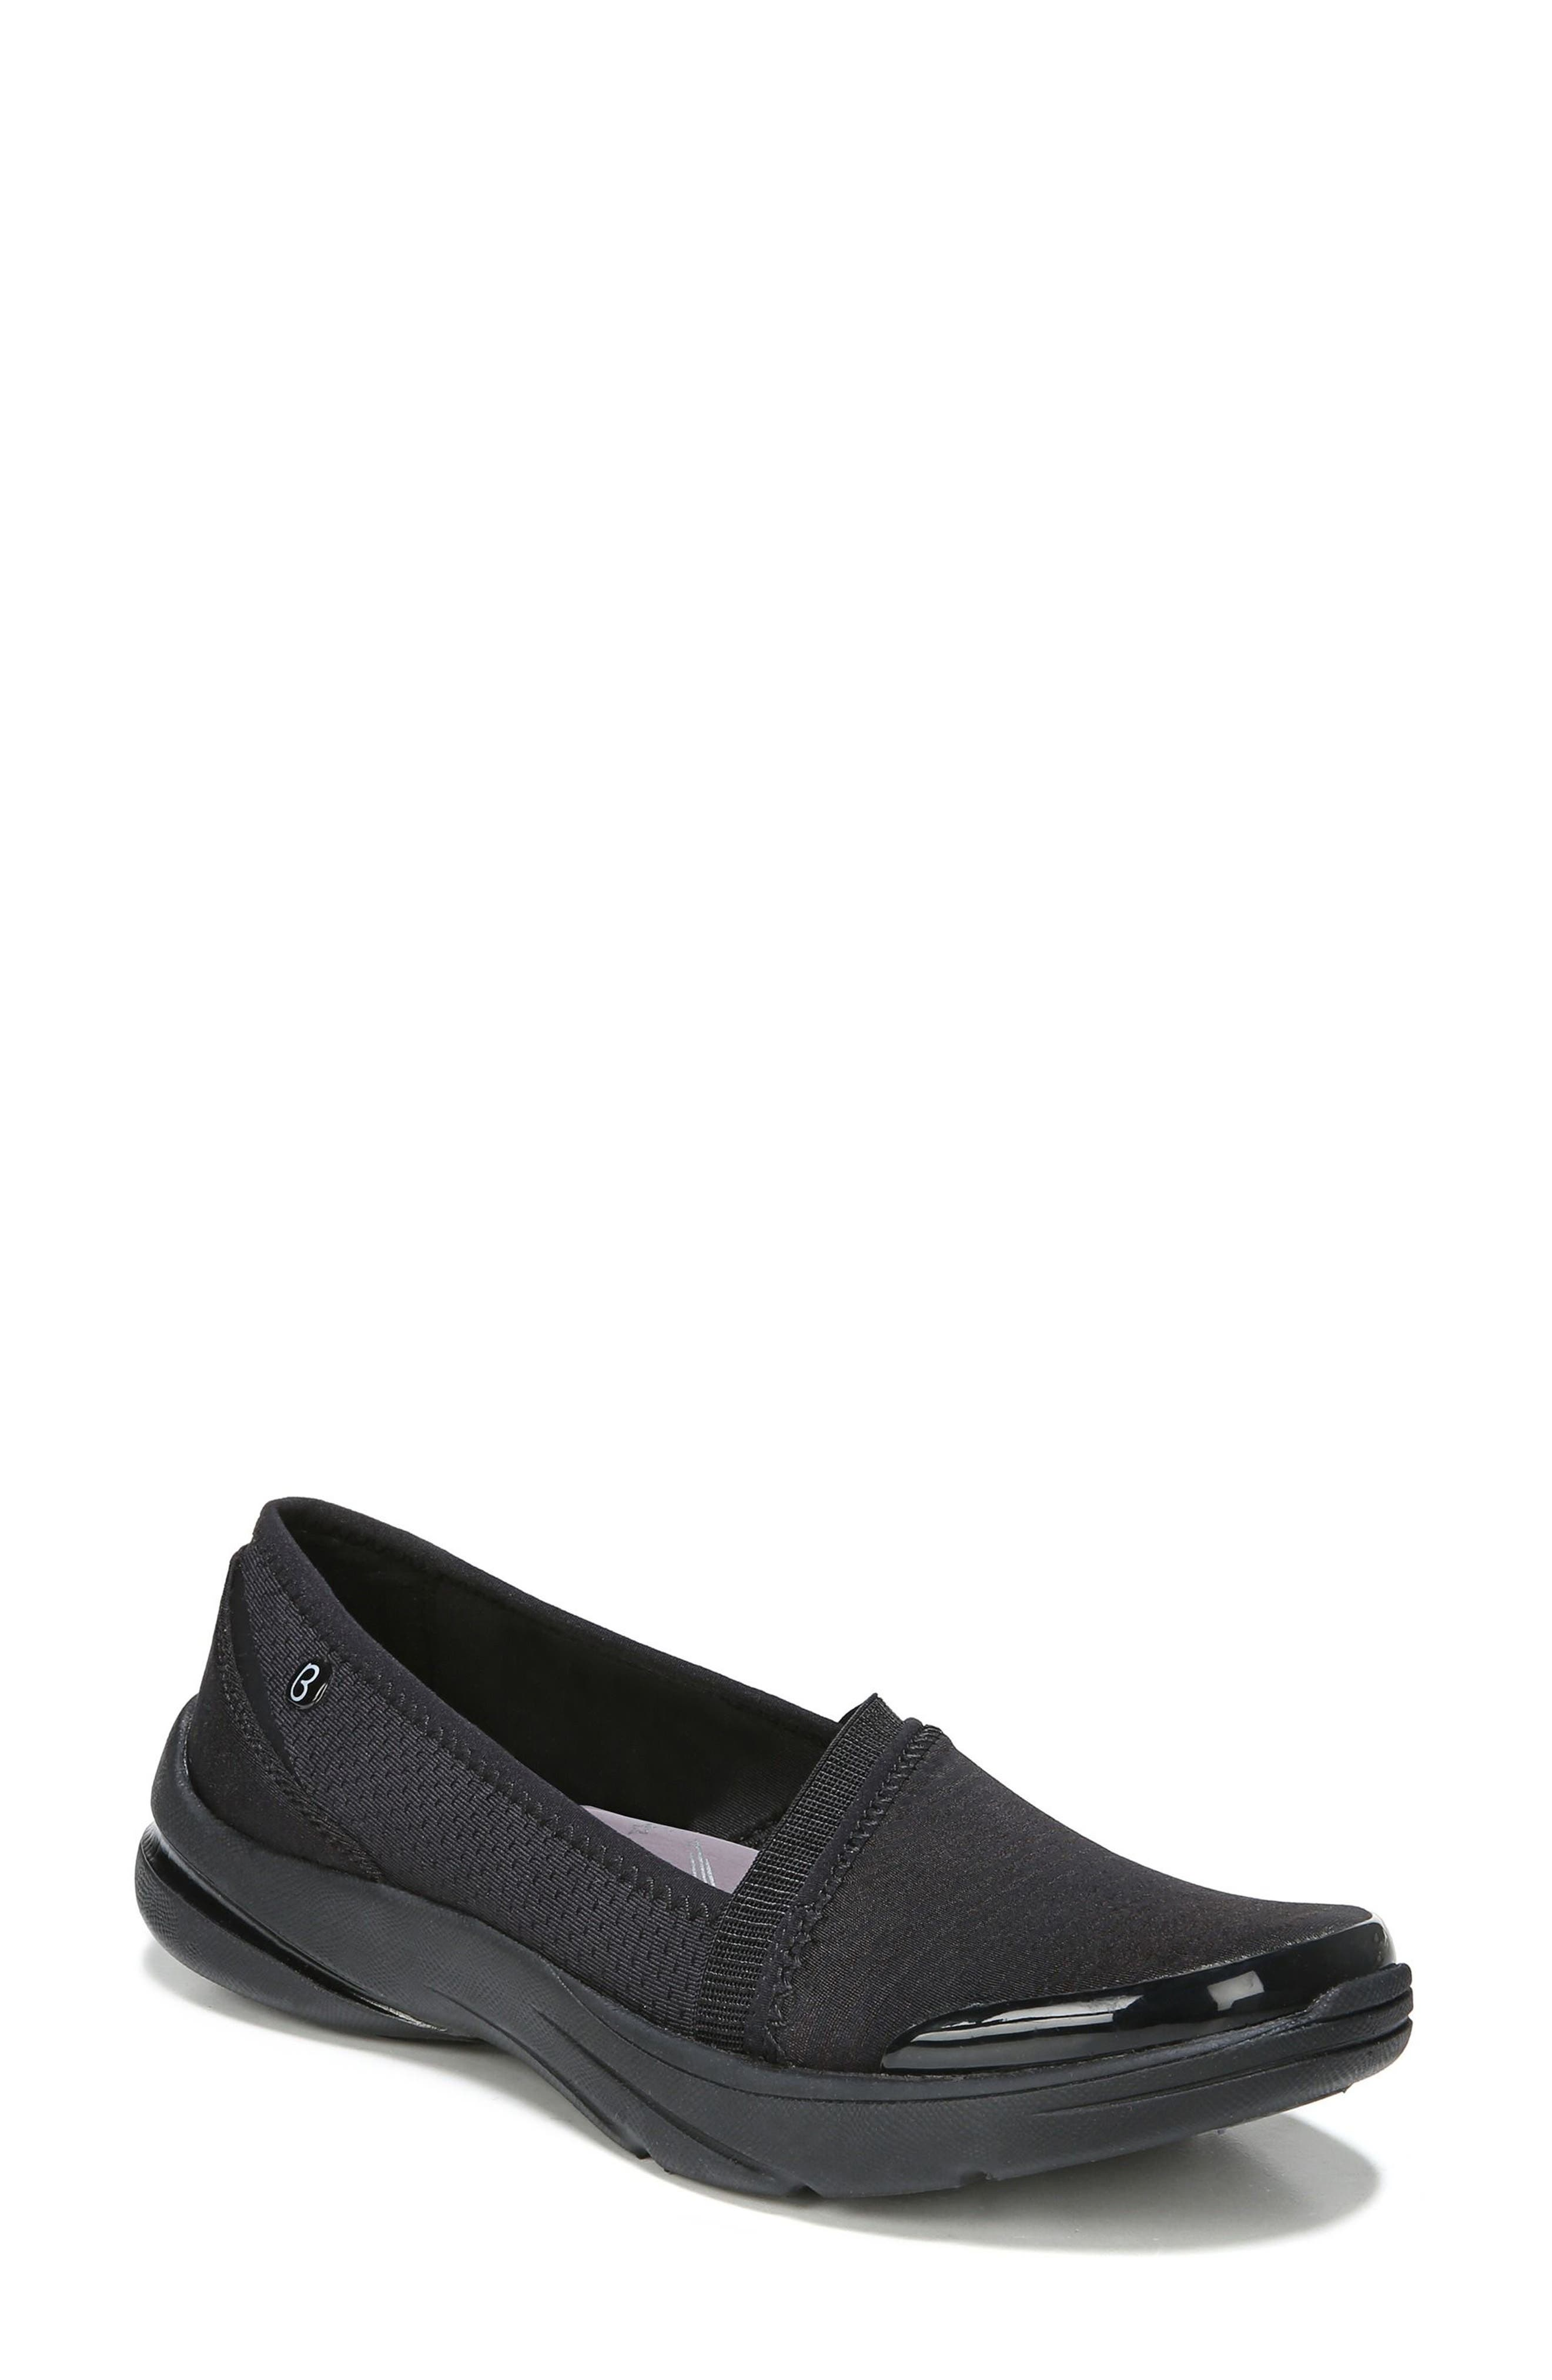 Lollipop Slip-On Sneaker,                             Main thumbnail 1, color,                             BLACK FABRIC